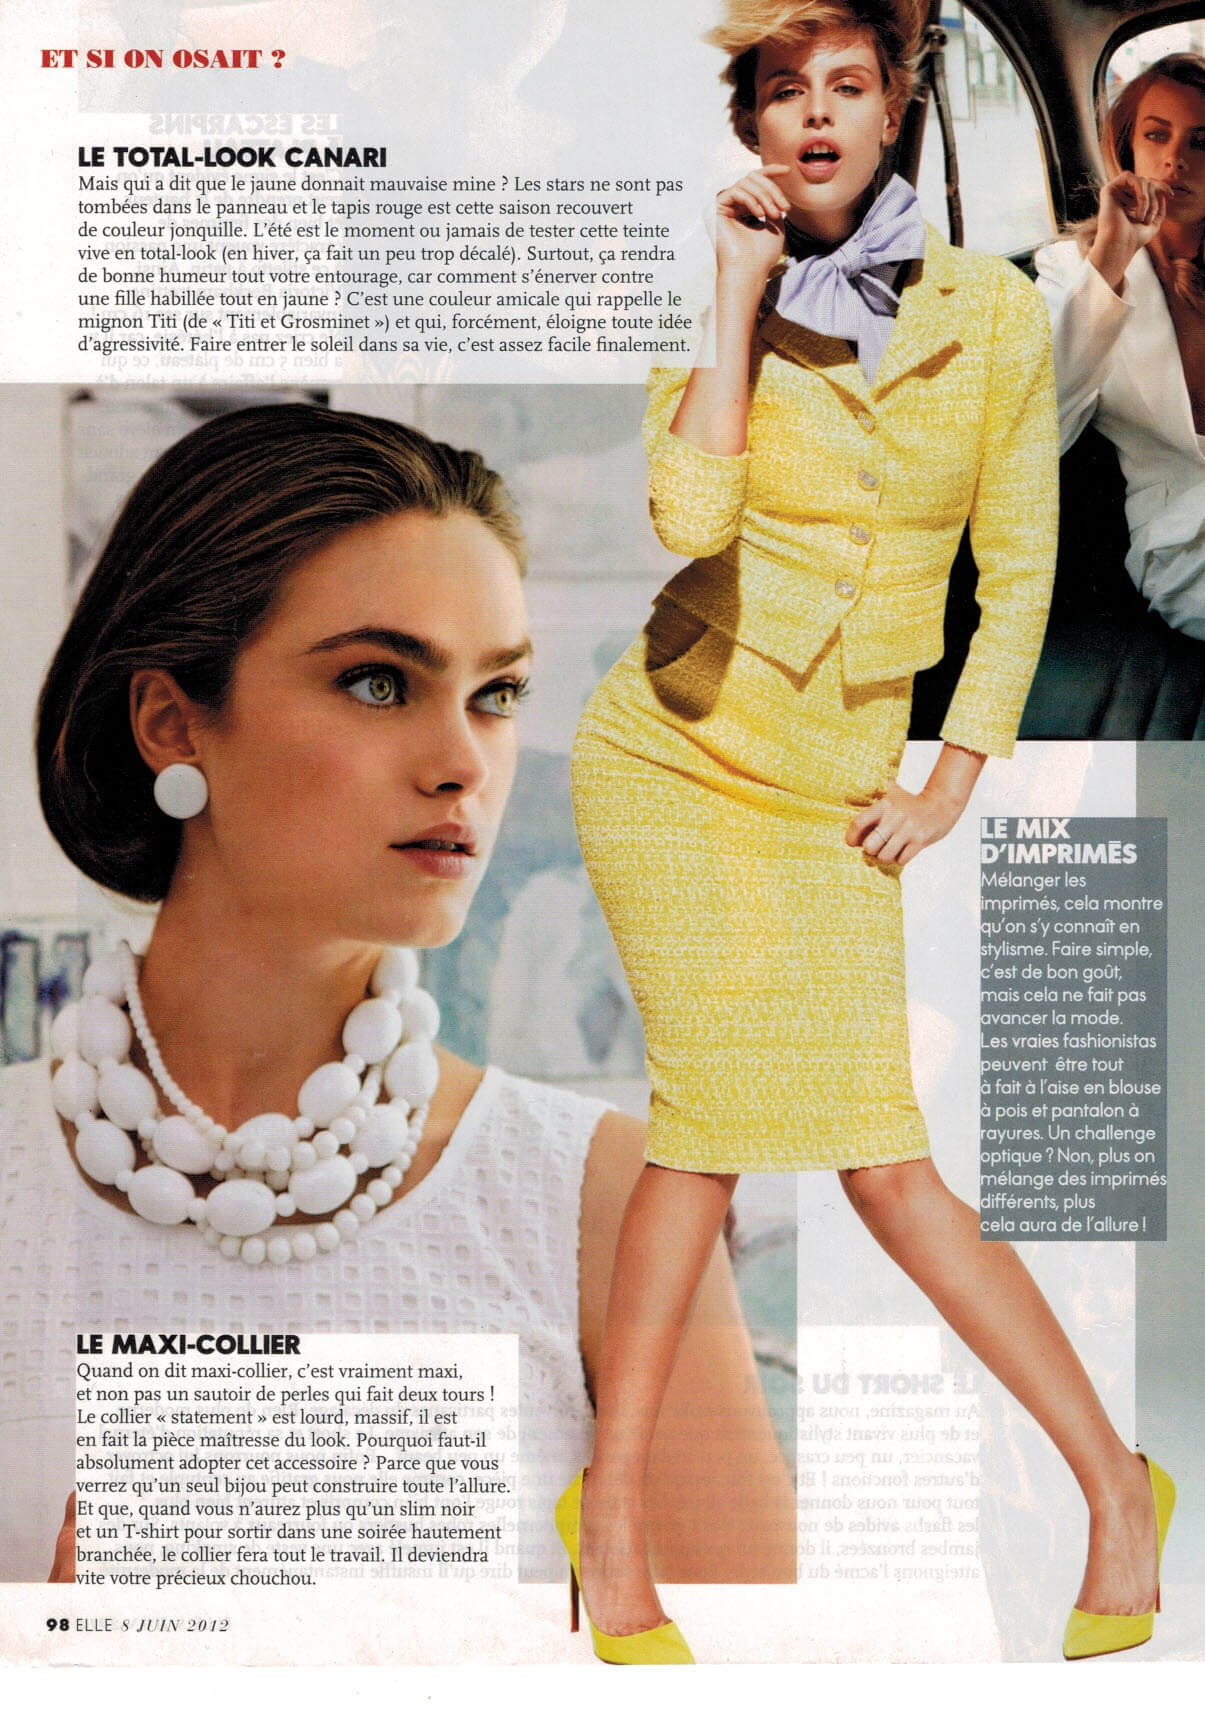 femme-pied-rentre-mode-look-canari-magazine